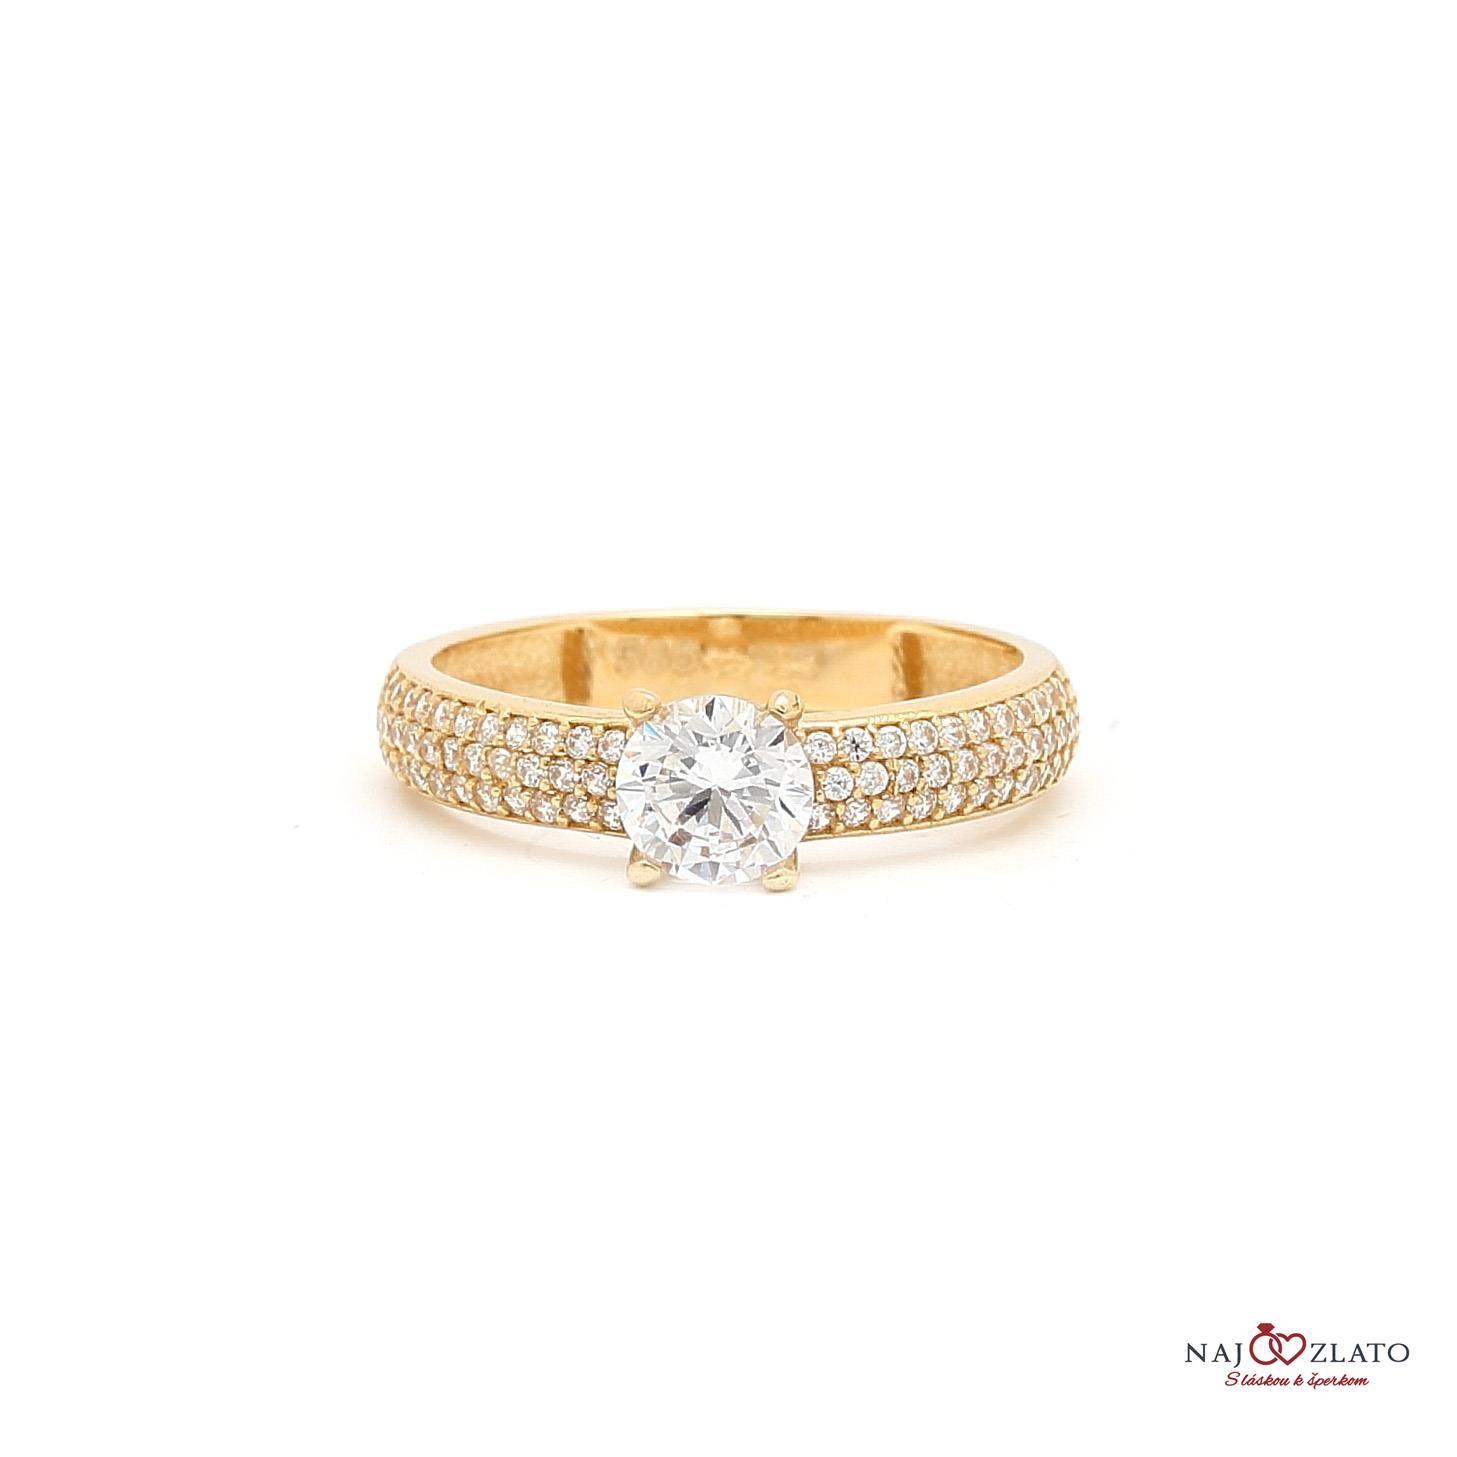 zlatý zásnubný prsteň luanna zlatý zásnubný prsteň luanna 1 ... 88fb2d3cad0